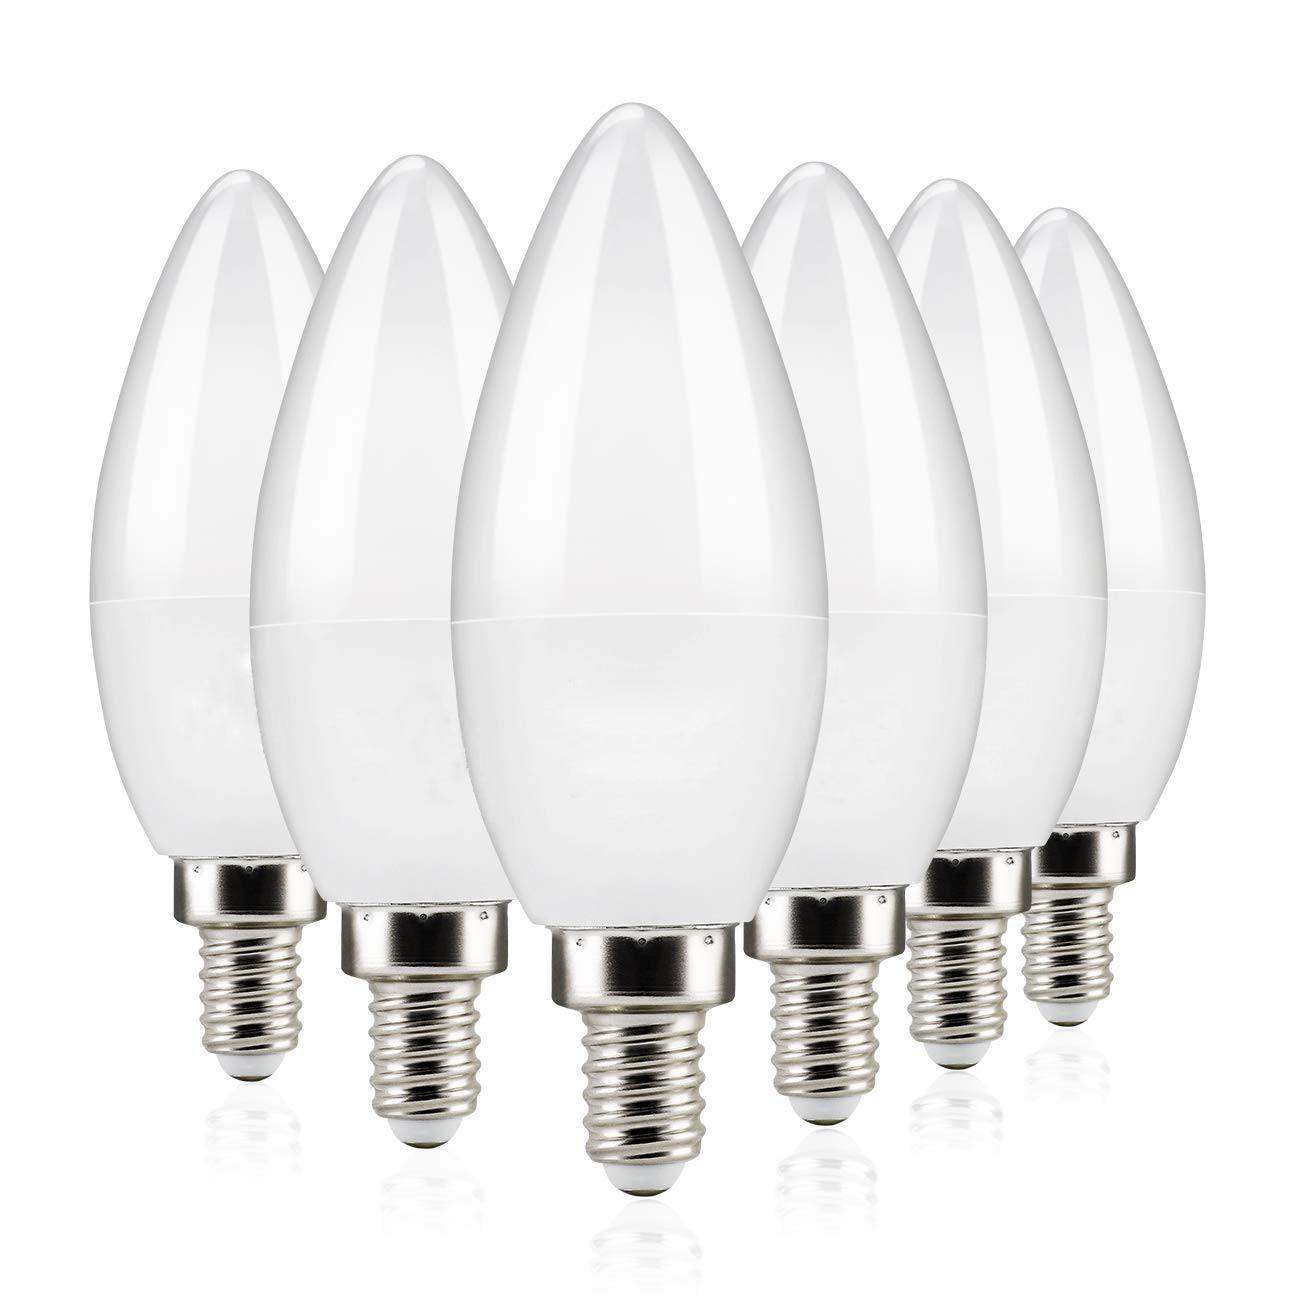 High Brightness E14 Led Candle Bulb 110V 220V Save Energy spotlight Warm/cool white chandlier crystal Lamp Bombillas Home Light